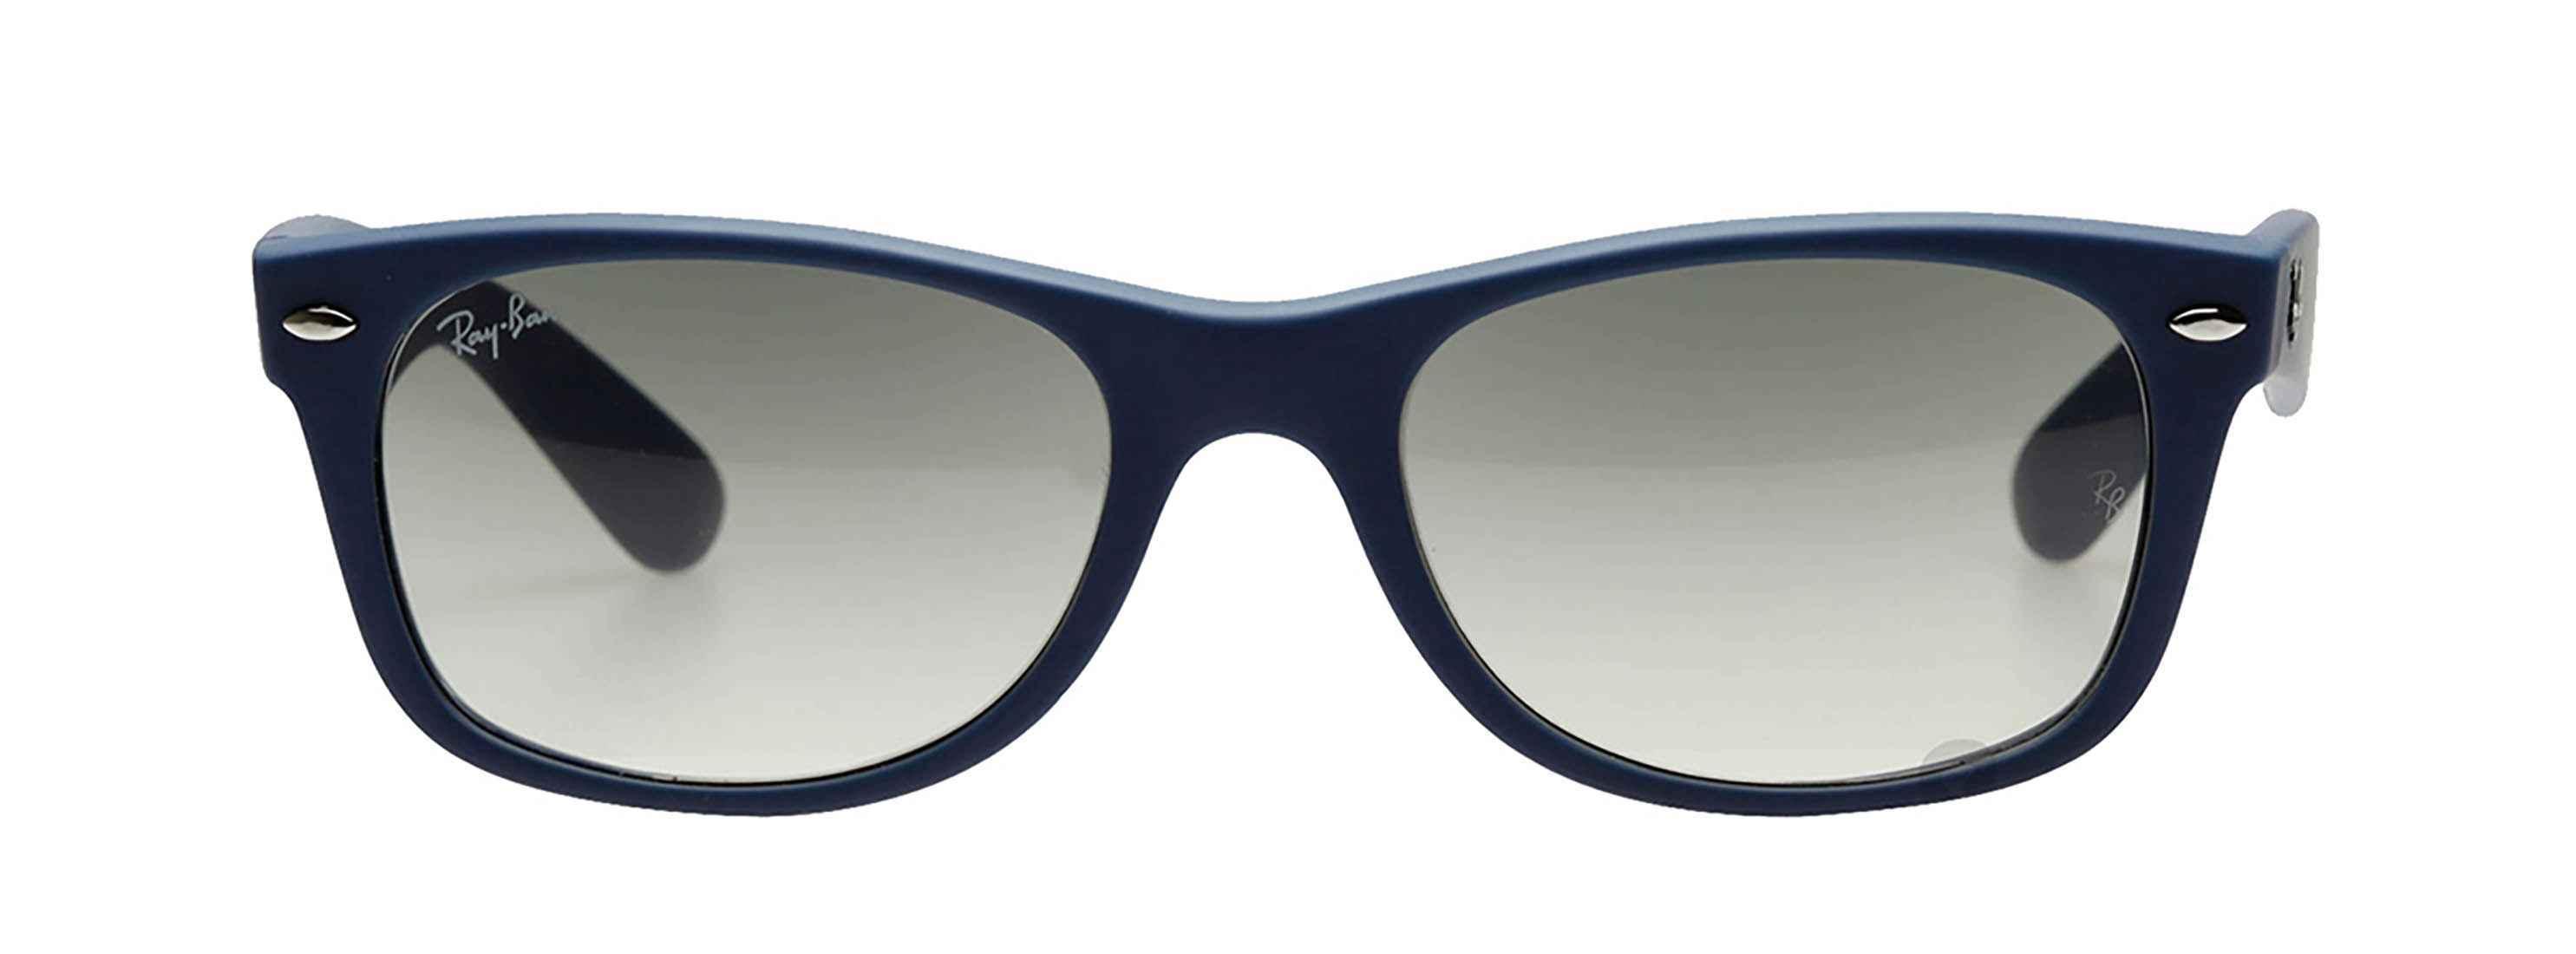 Ray-Ban Sunglasses 2132 1 250 2970x1100